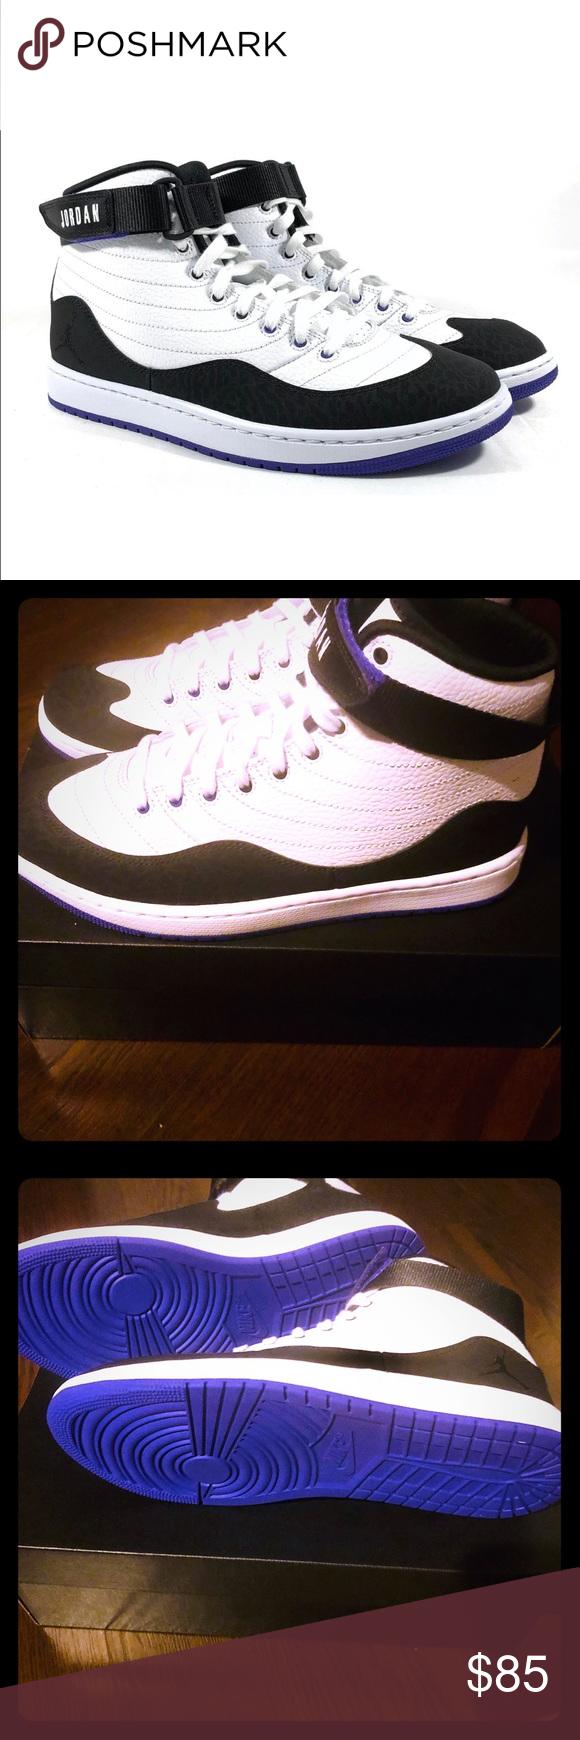 Nike Air Jordan KO 23, Men Size 9